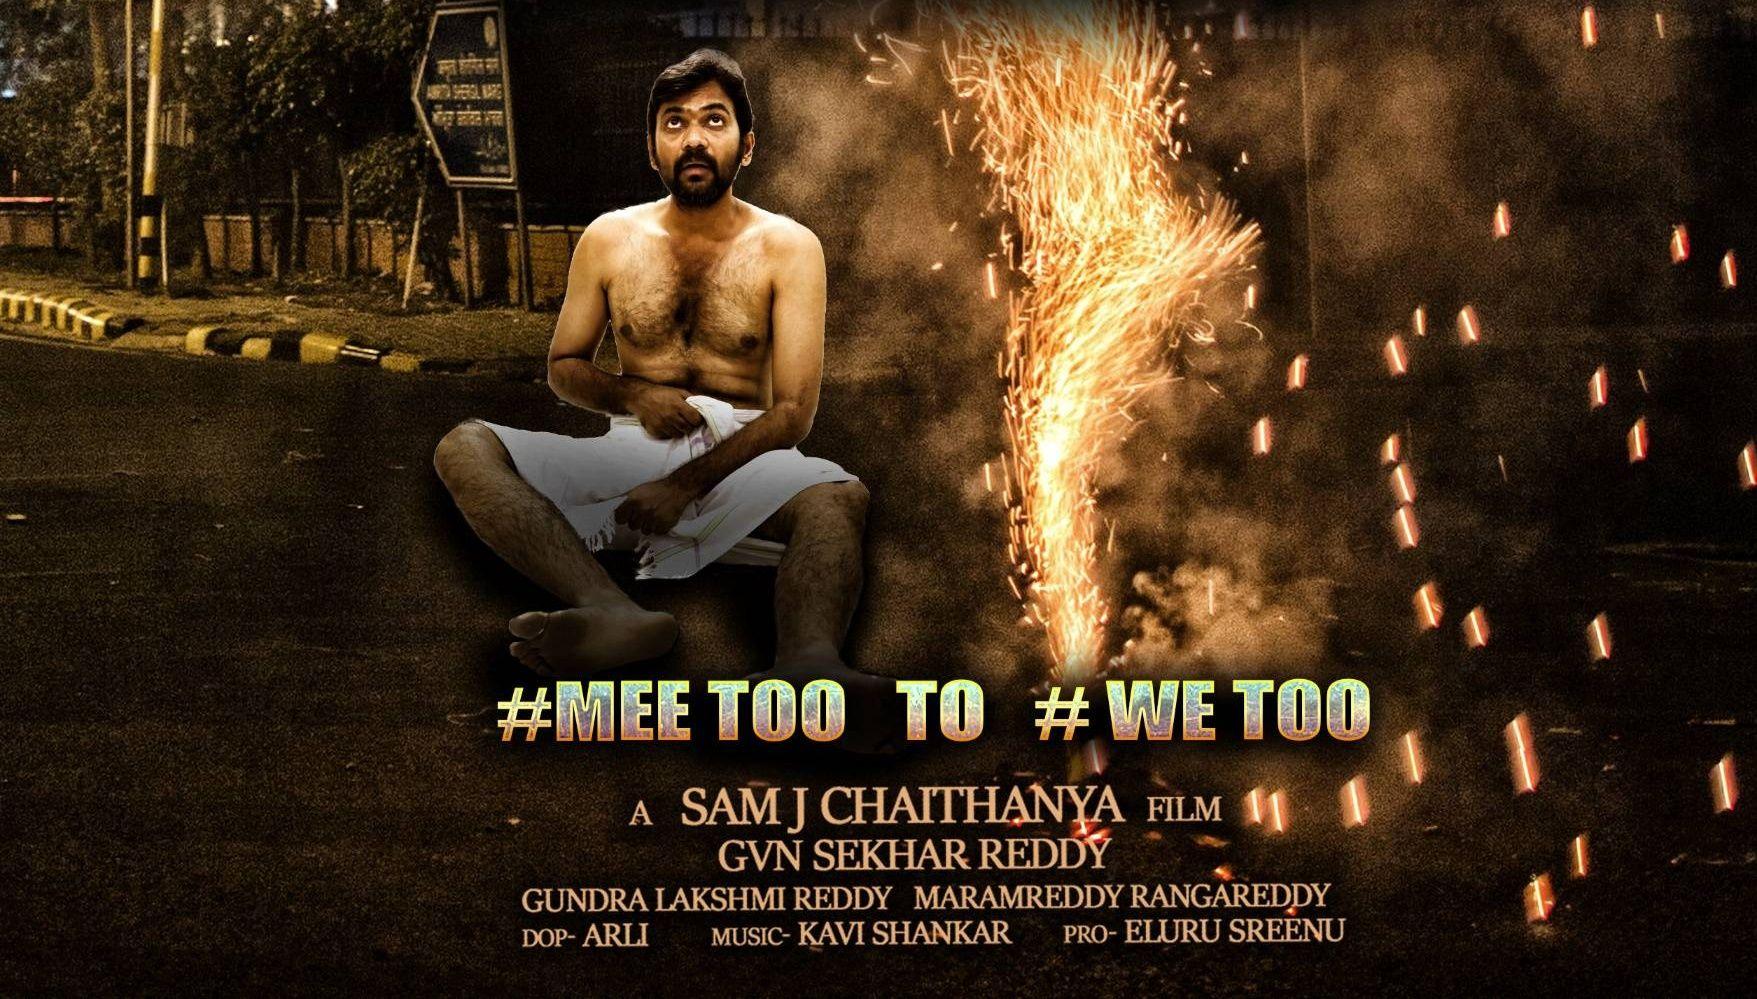 Yedu Chepala Katha Movie Diwali Poster Movie Posters Diwali